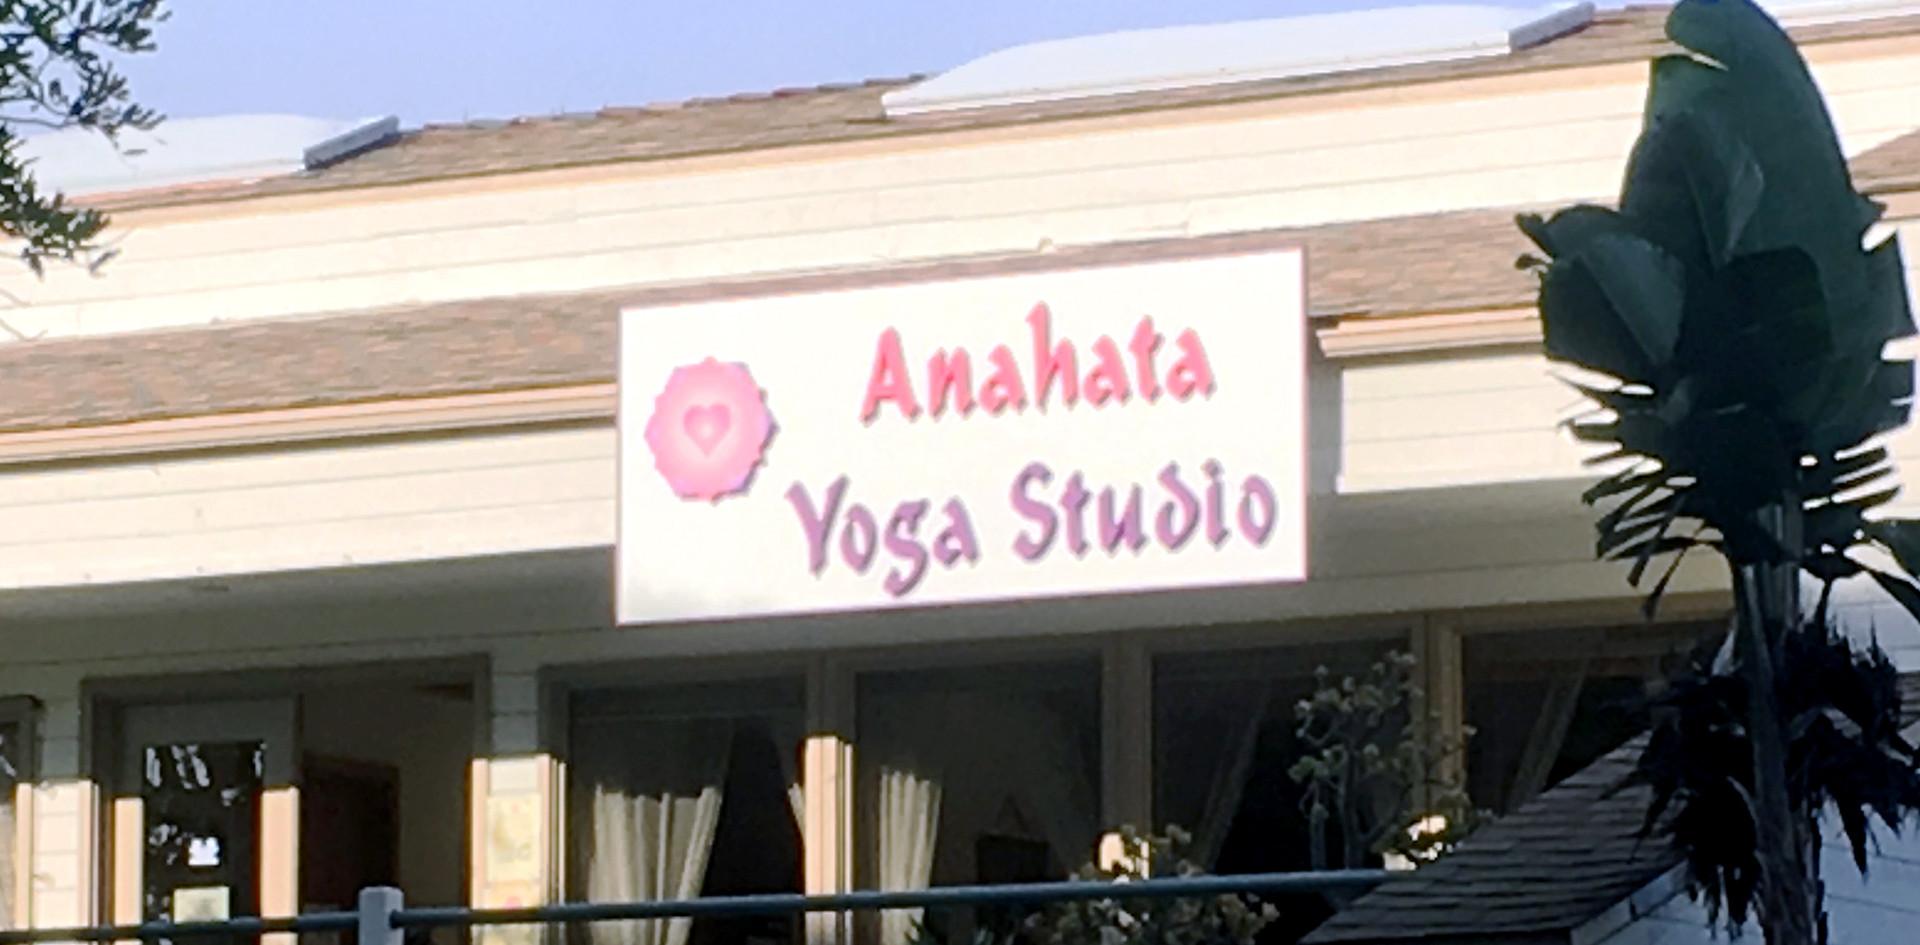 Anahata Yoga Studio street view.jpg